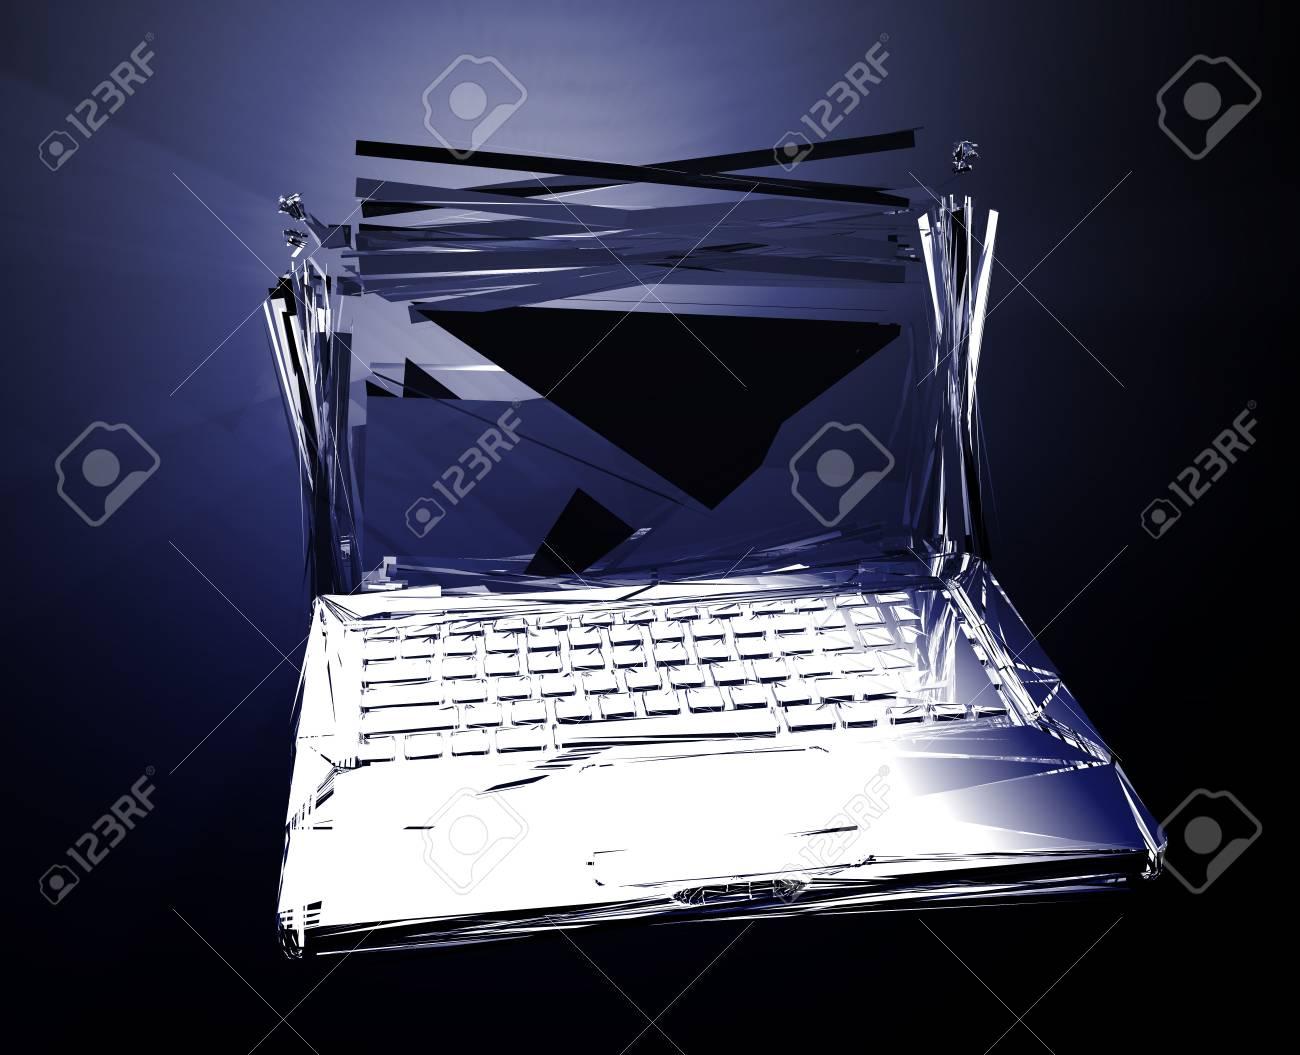 Computer technology failure with broken notebook concept illustration Stock Illustration - 5092727